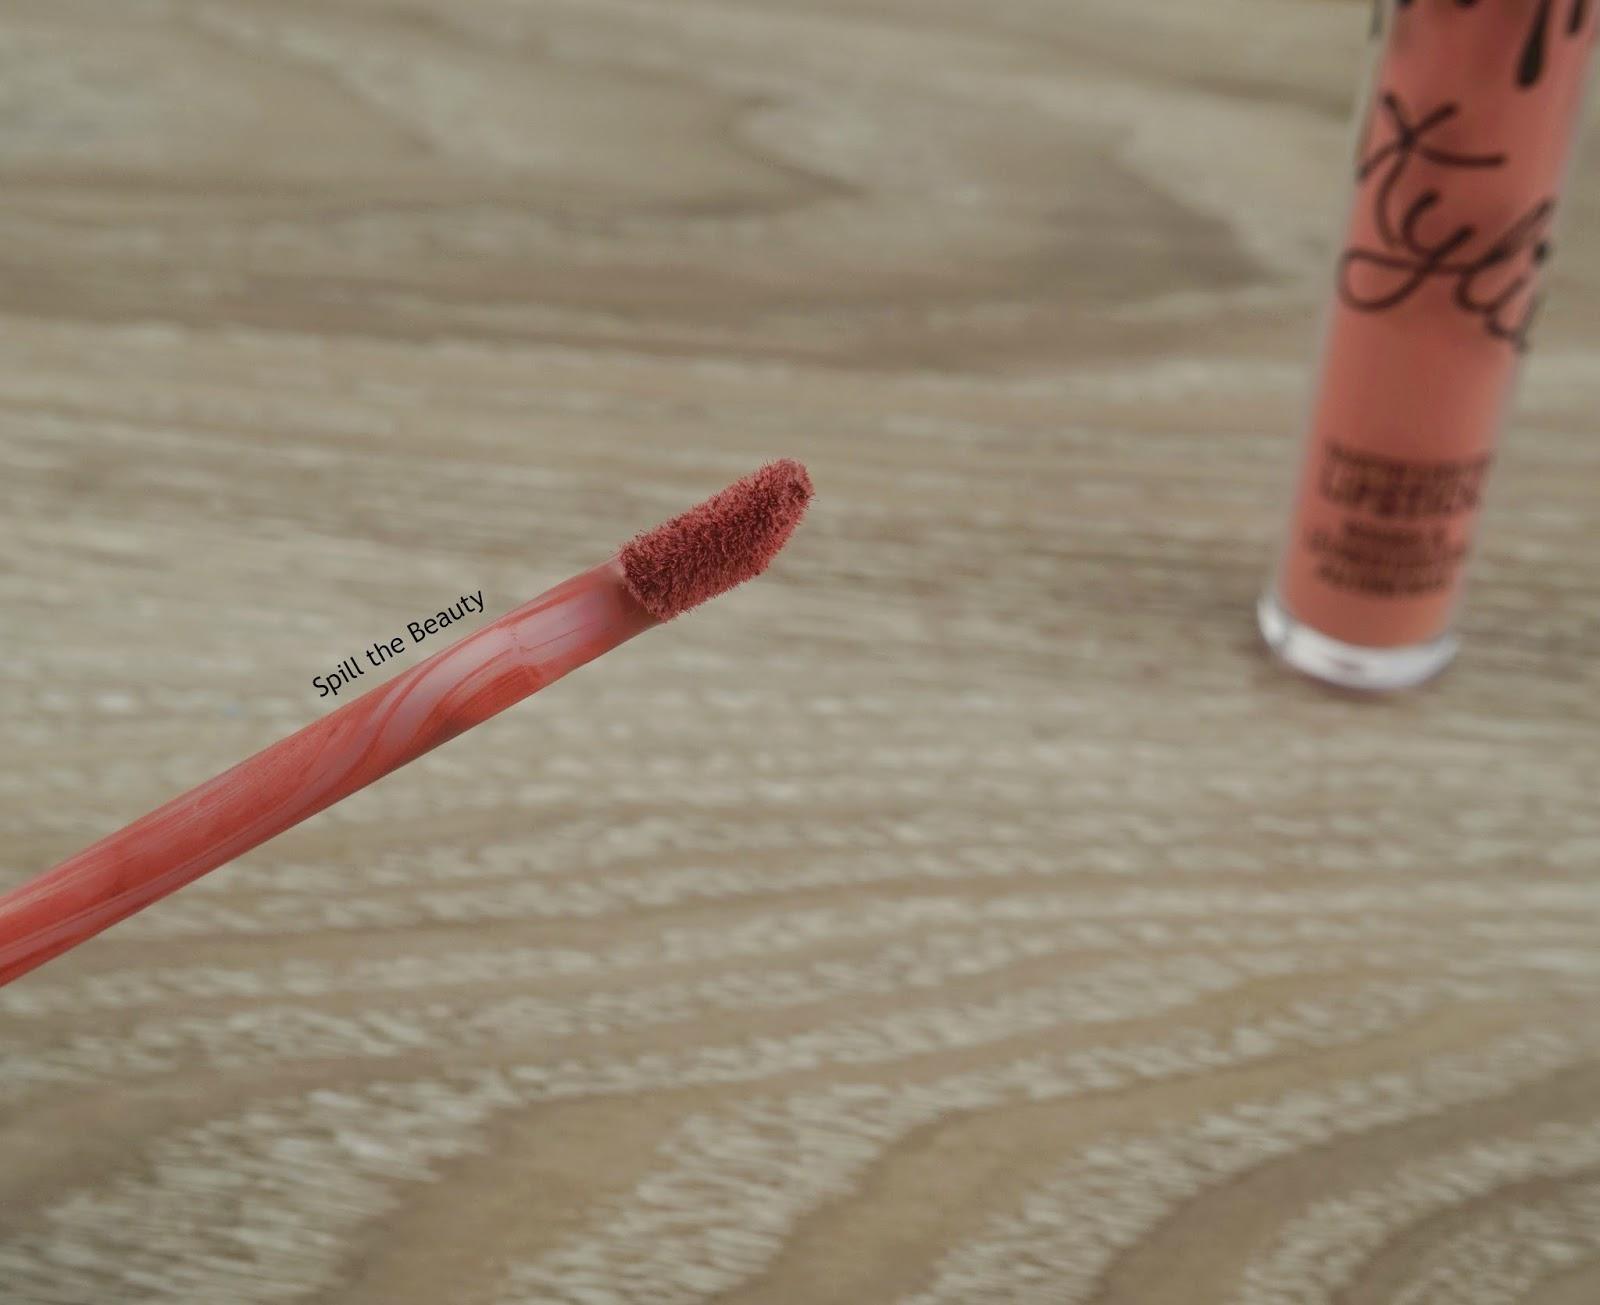 kylie cosmetics matte liquid lipstick posie k swatches comparison dupe colourpop dose of colors wet n wild